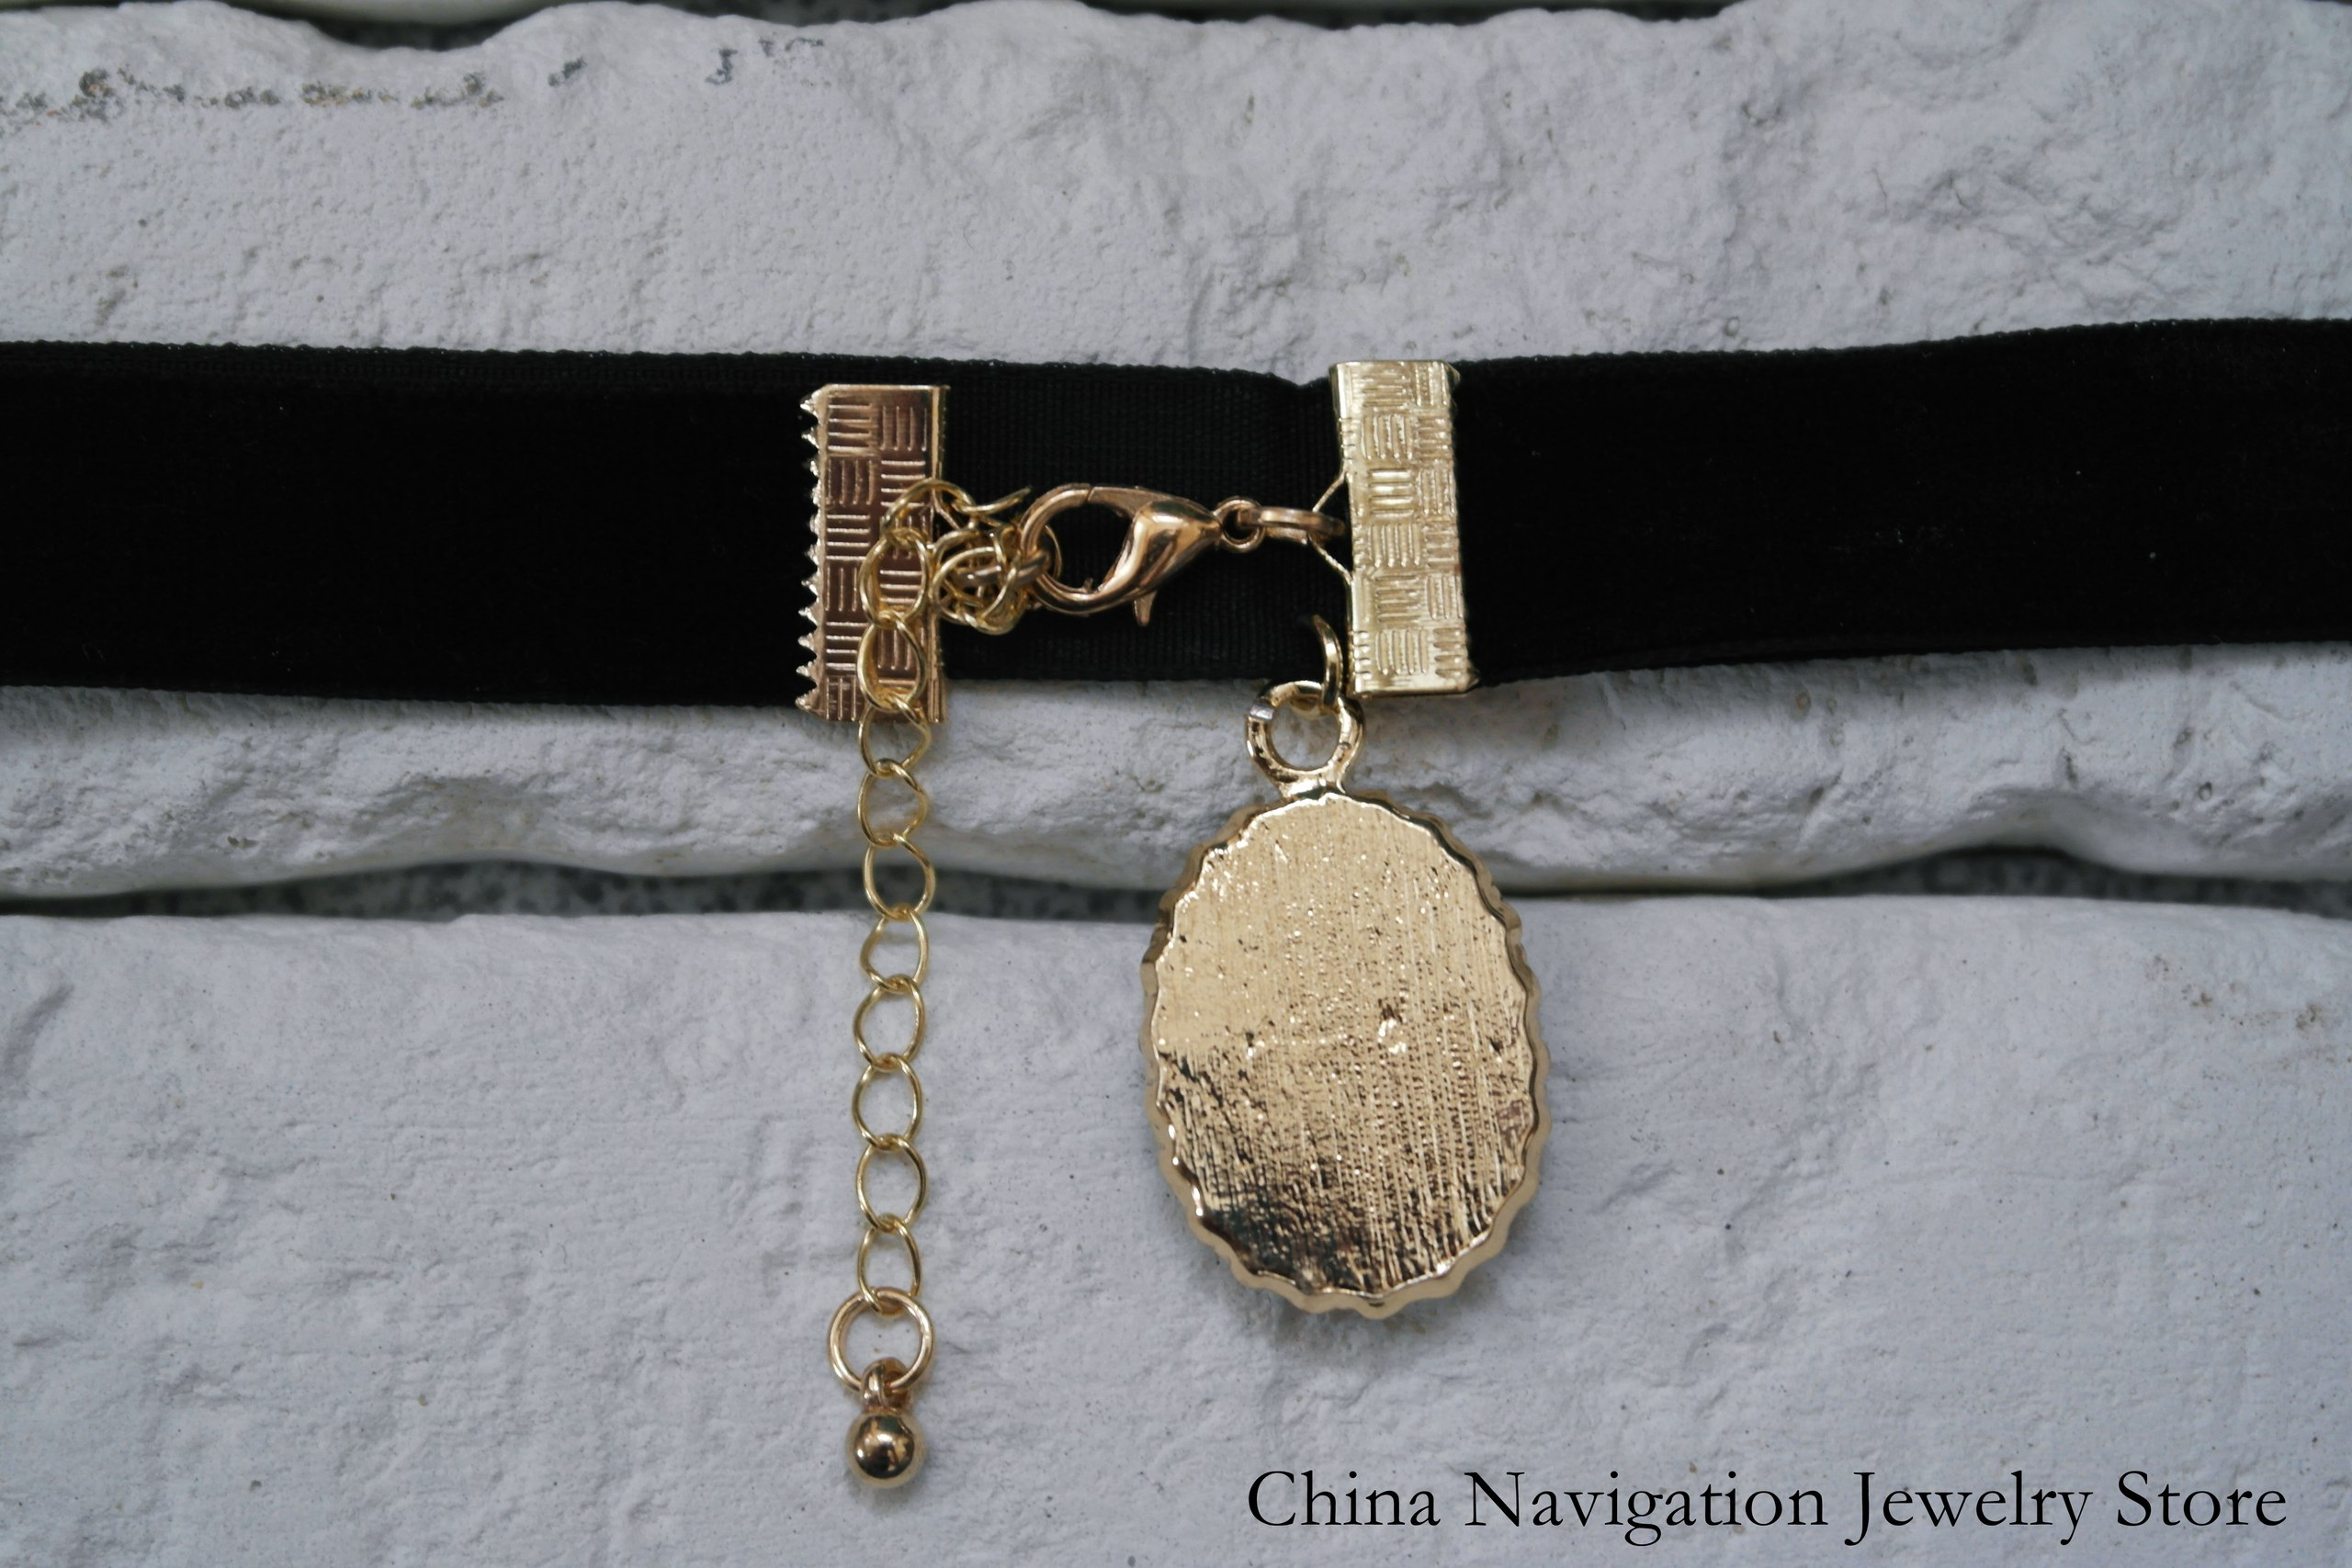 Чокер с камнем от China Navigation Jewelry Store